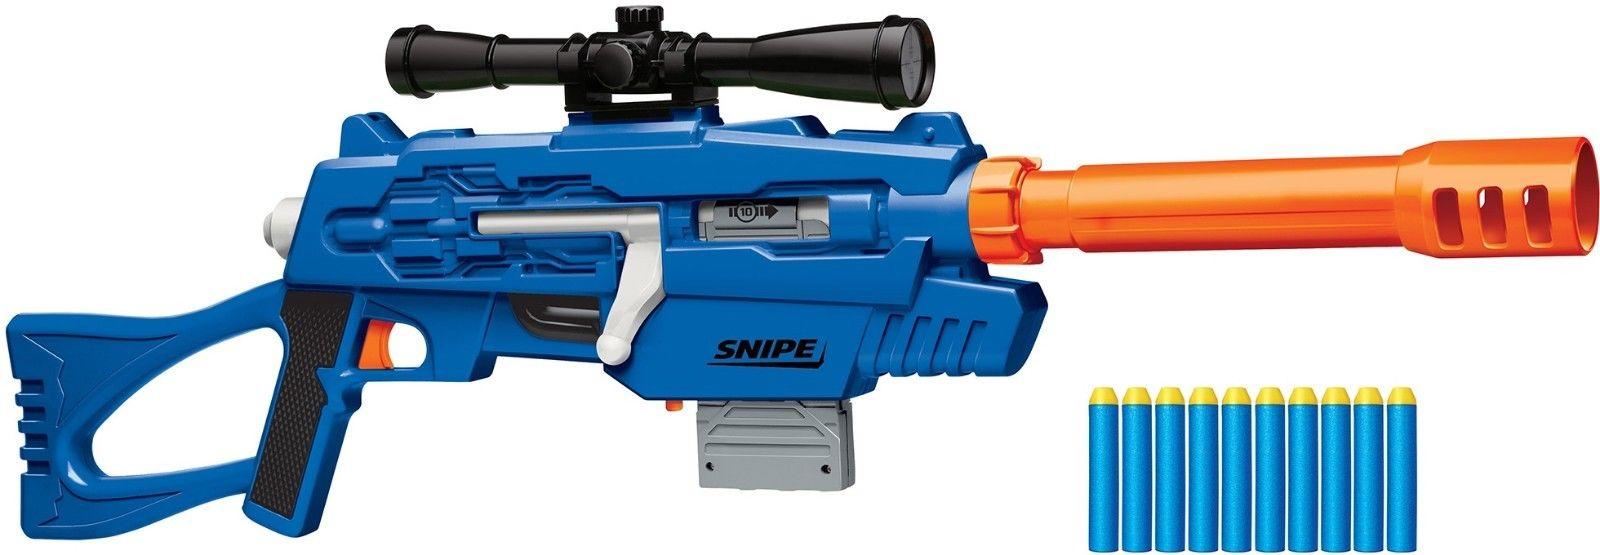 Snipe (Air Warriors)